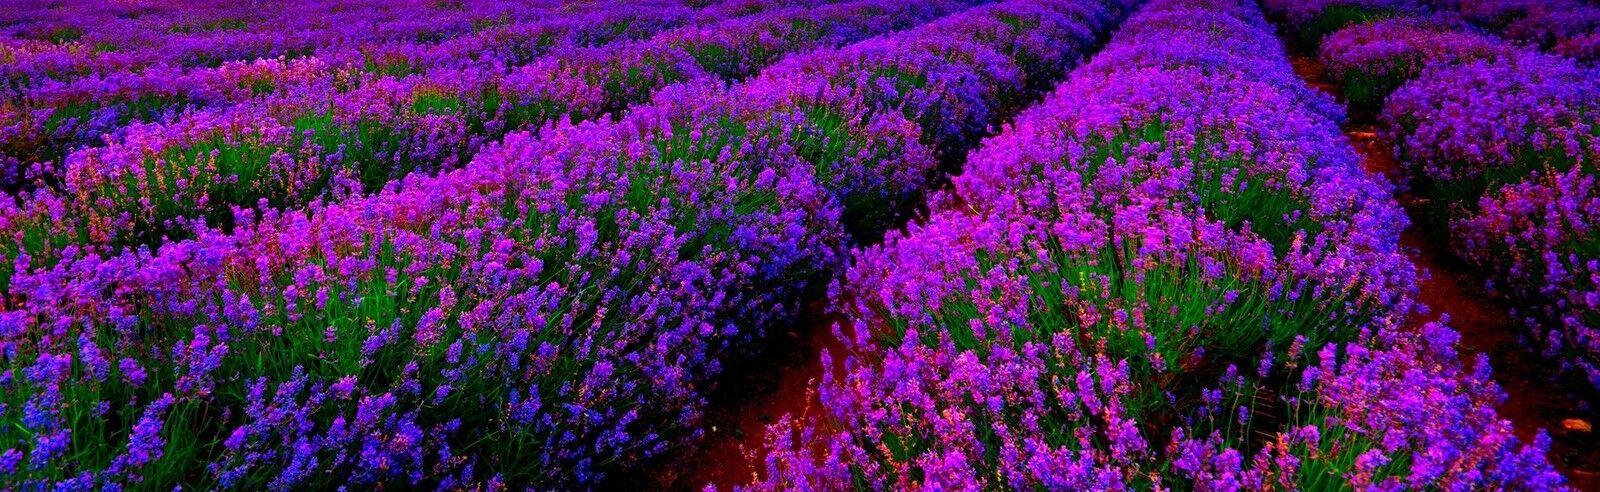 Lavender Farm ~